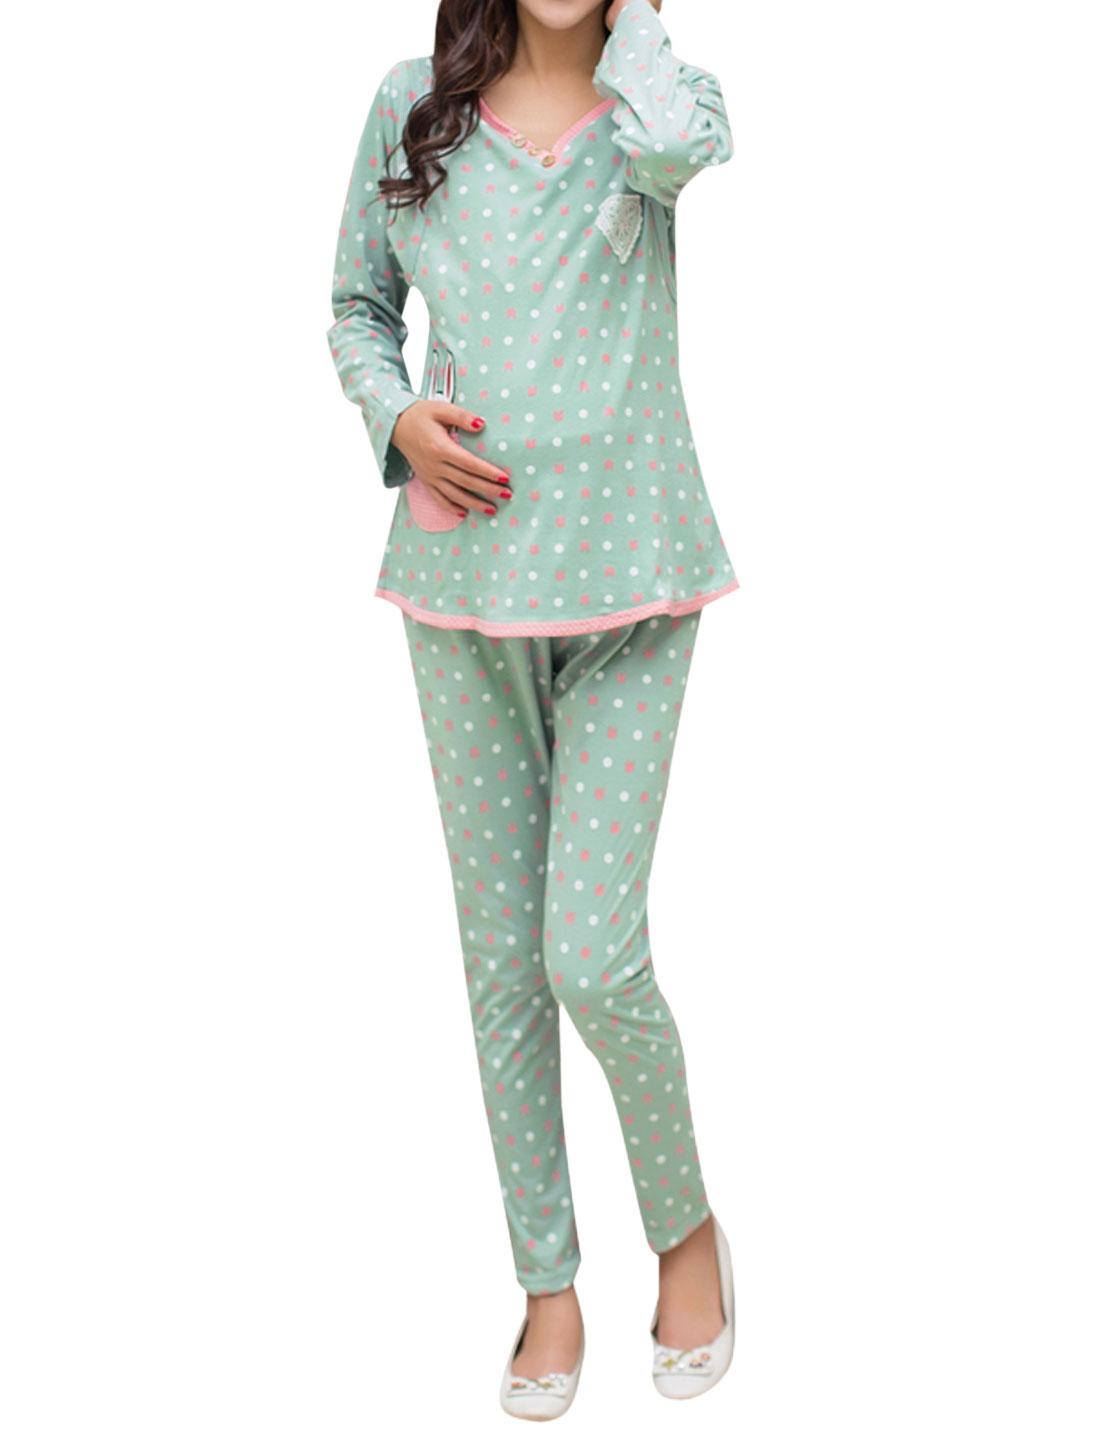 Maternity Cartoon Rabbit Dots Prints Piped Top w Pants Pajama Set Green M